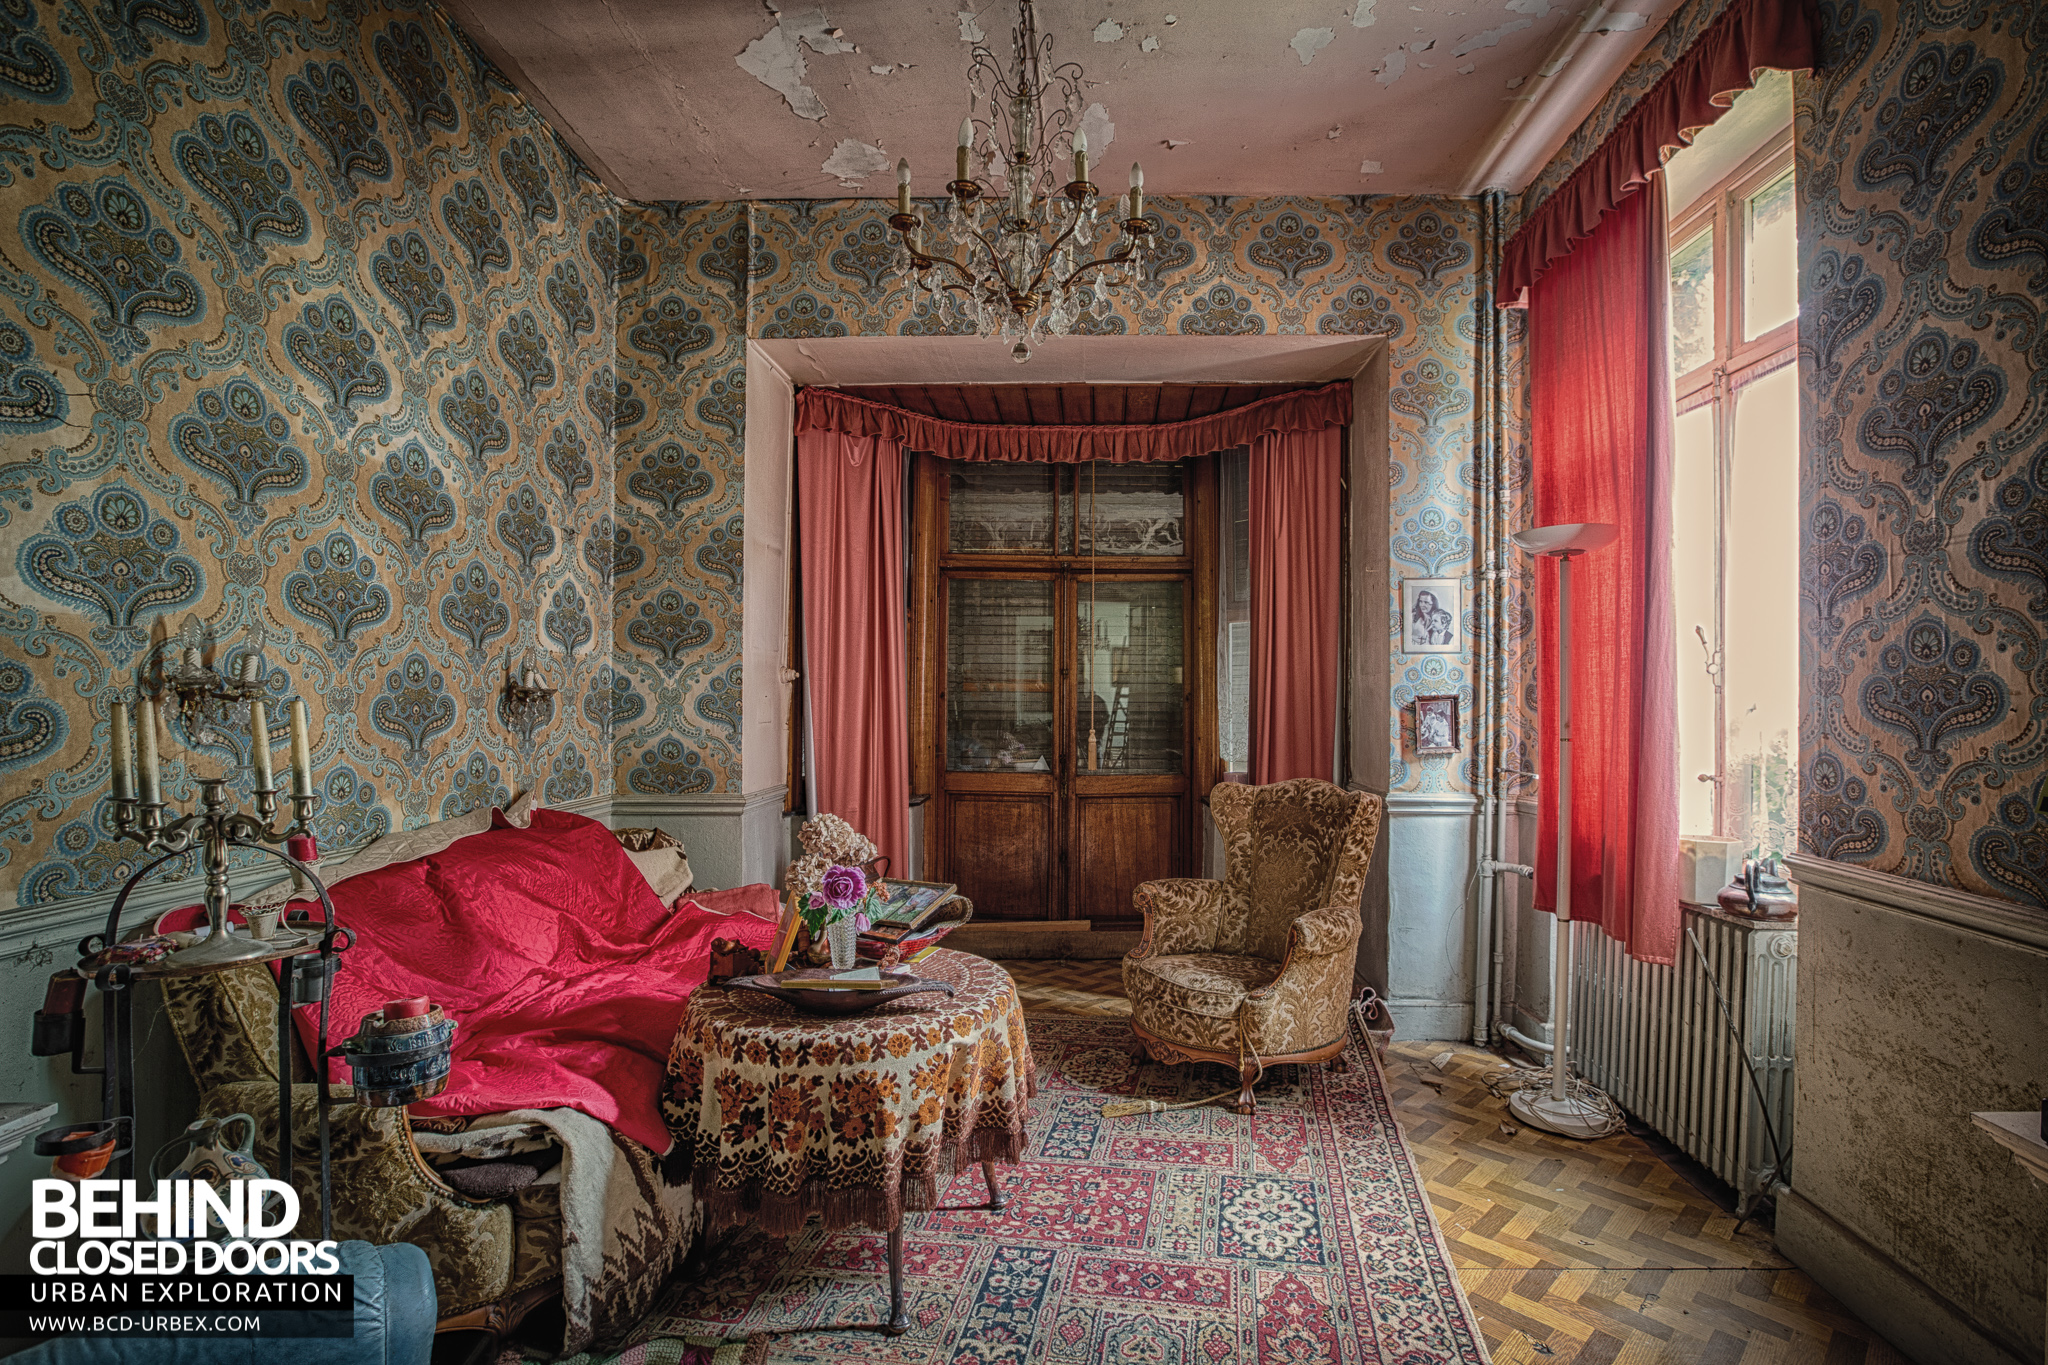 villa ro abandoned house belgium urbex behind closed doors urban exploring abandoned locations. Black Bedroom Furniture Sets. Home Design Ideas